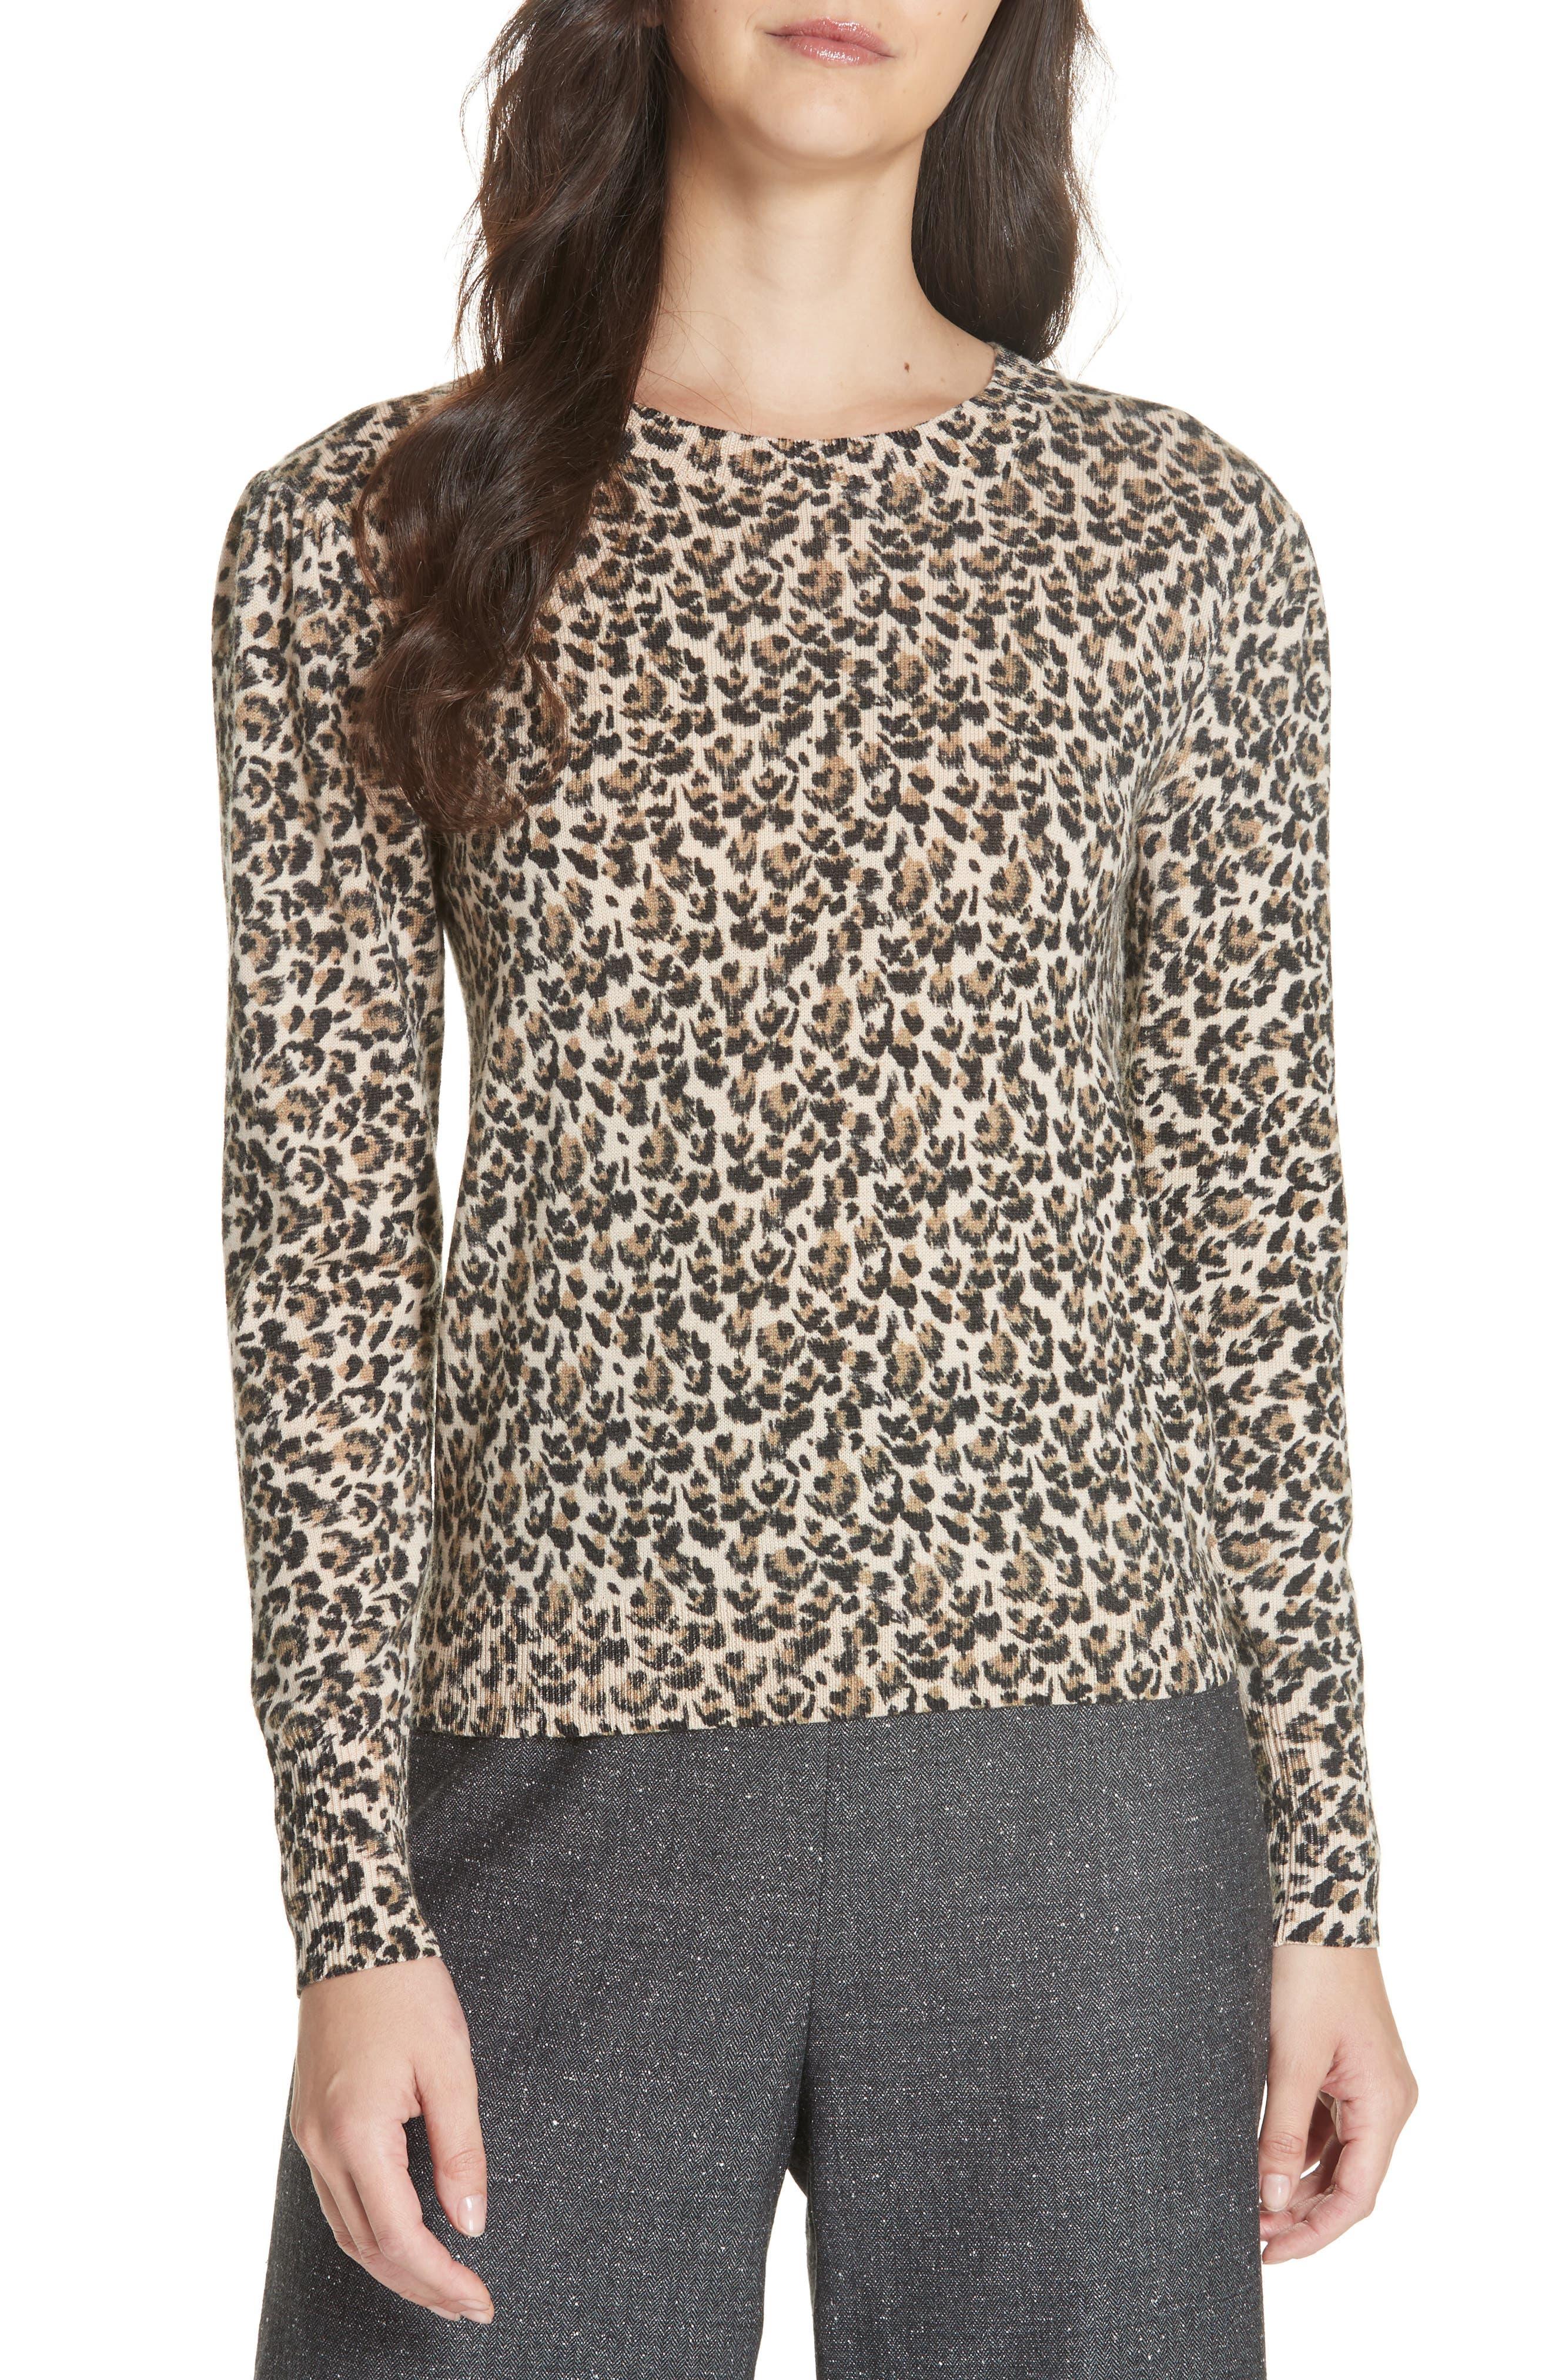 Leopard Print Wool Sweater,                             Main thumbnail 1, color,                             250